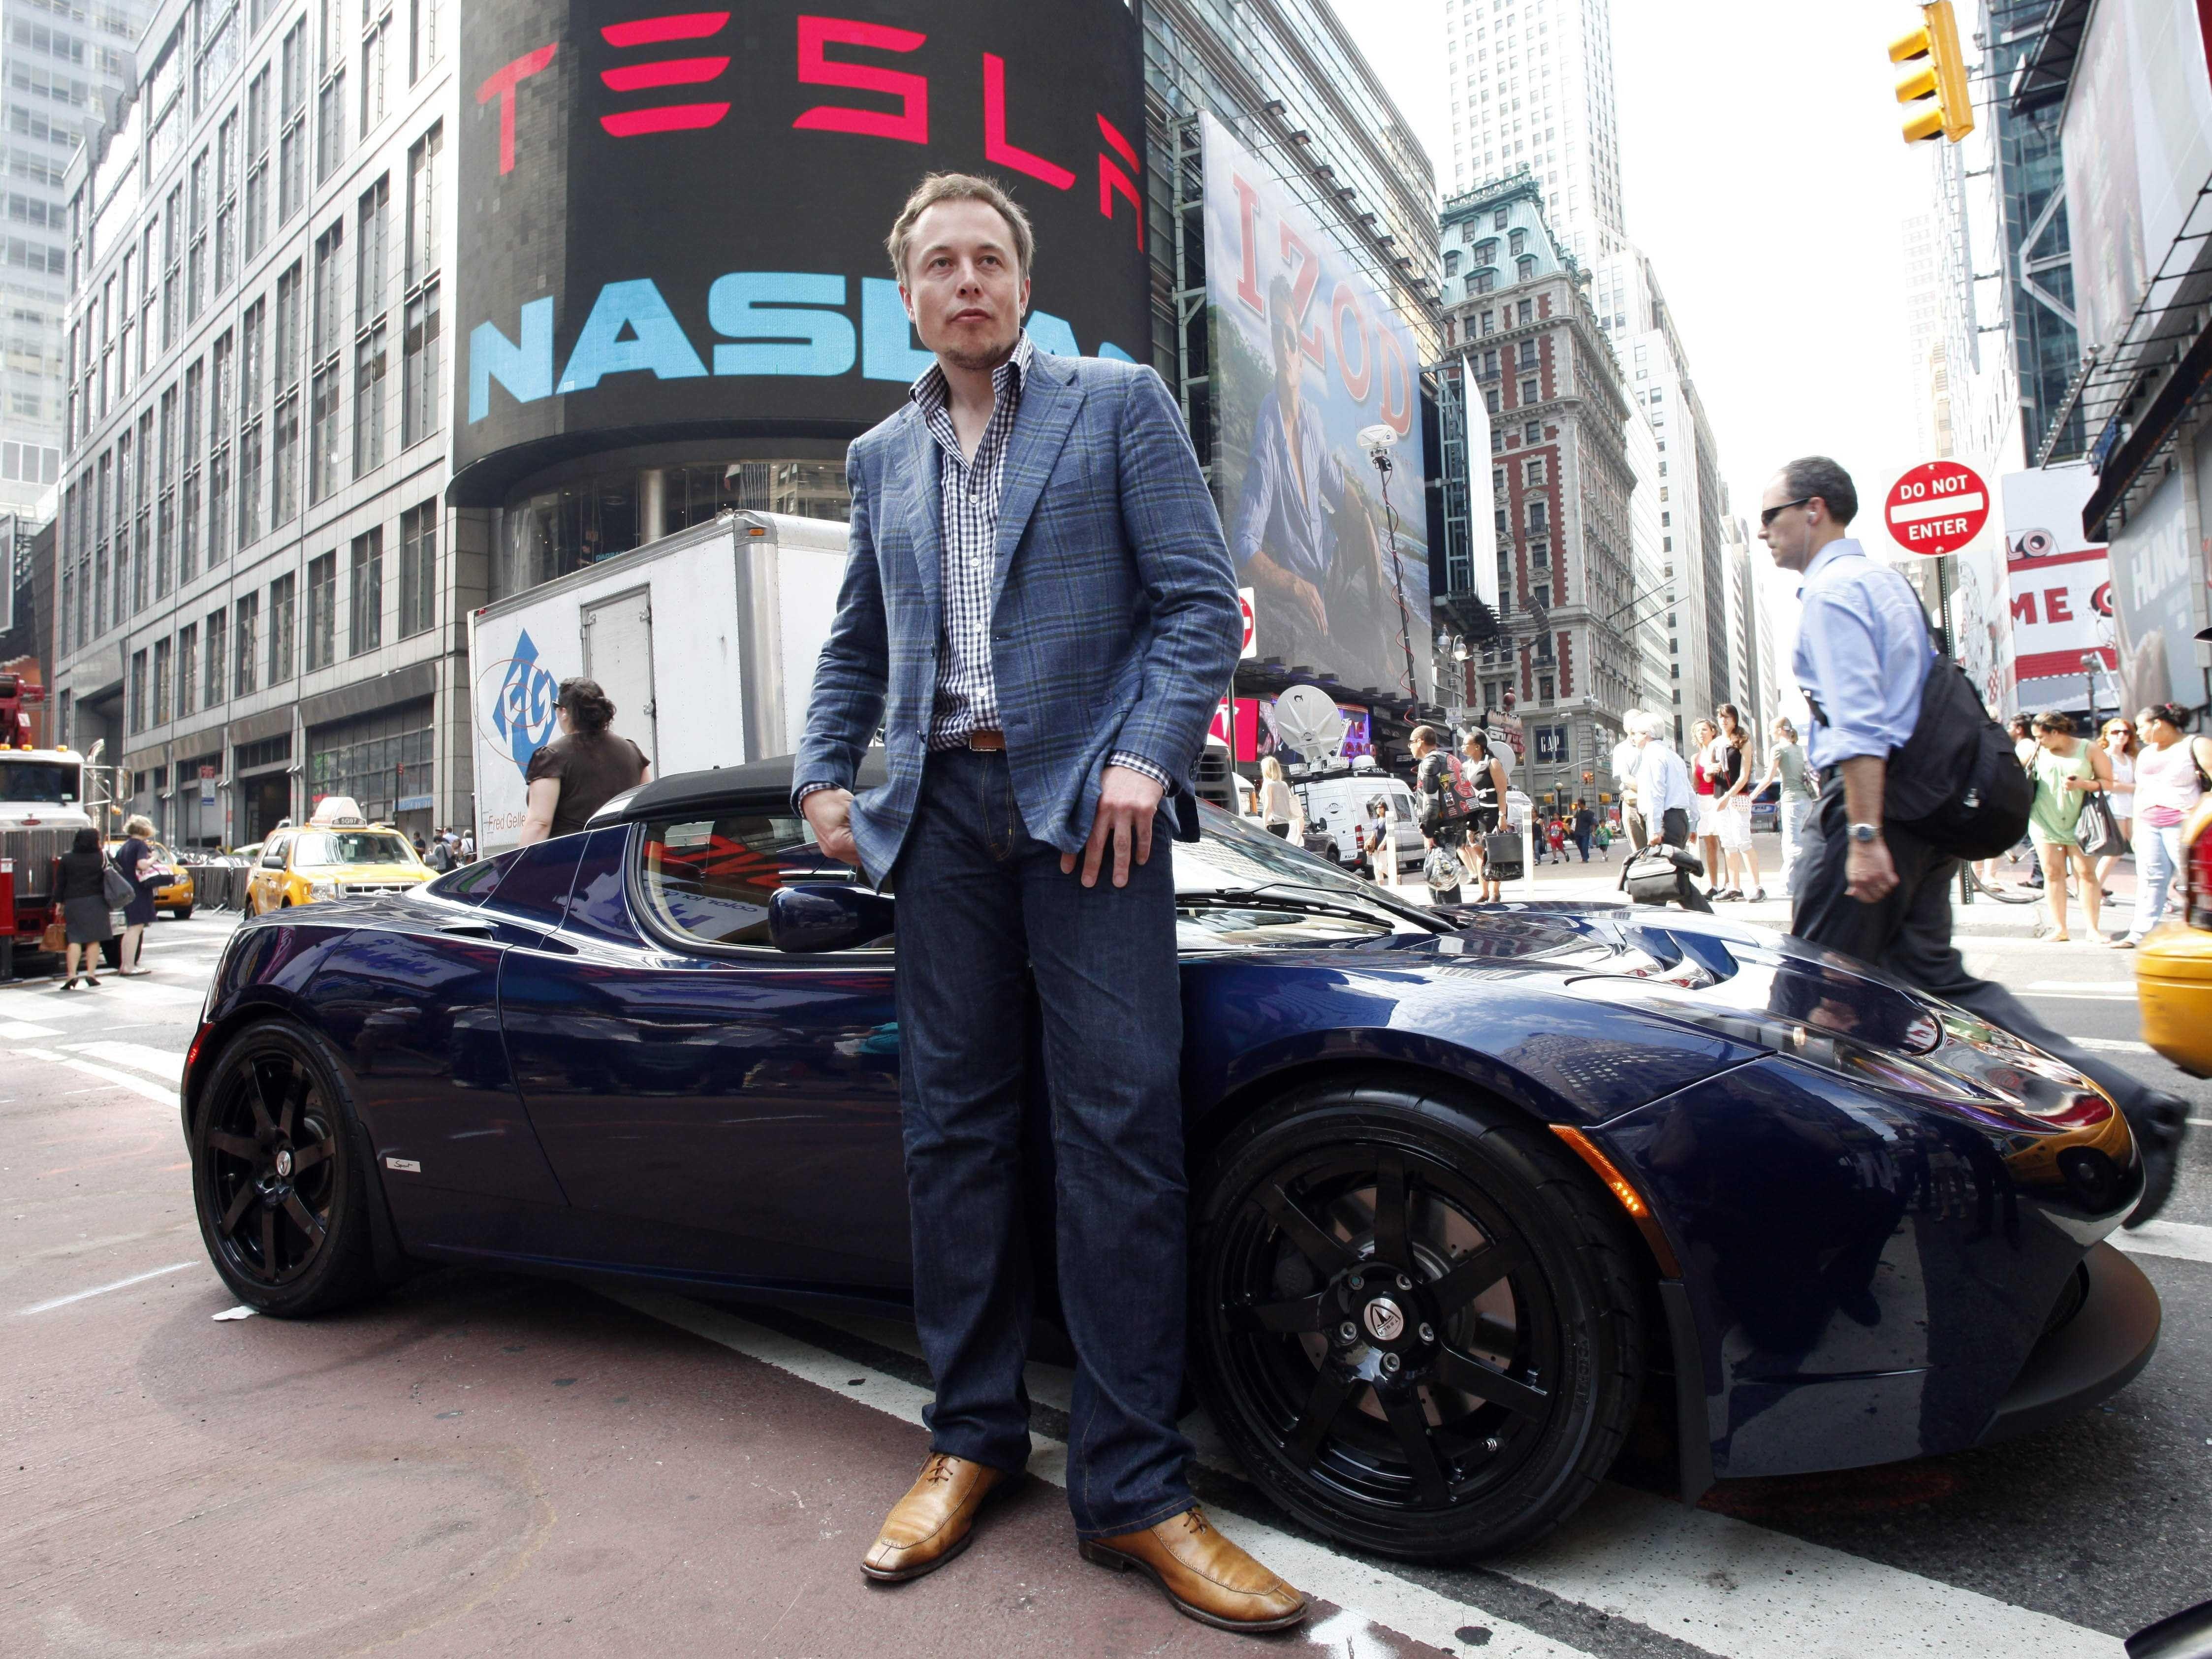 elon musk car collection - Google Search   Elon musk ...